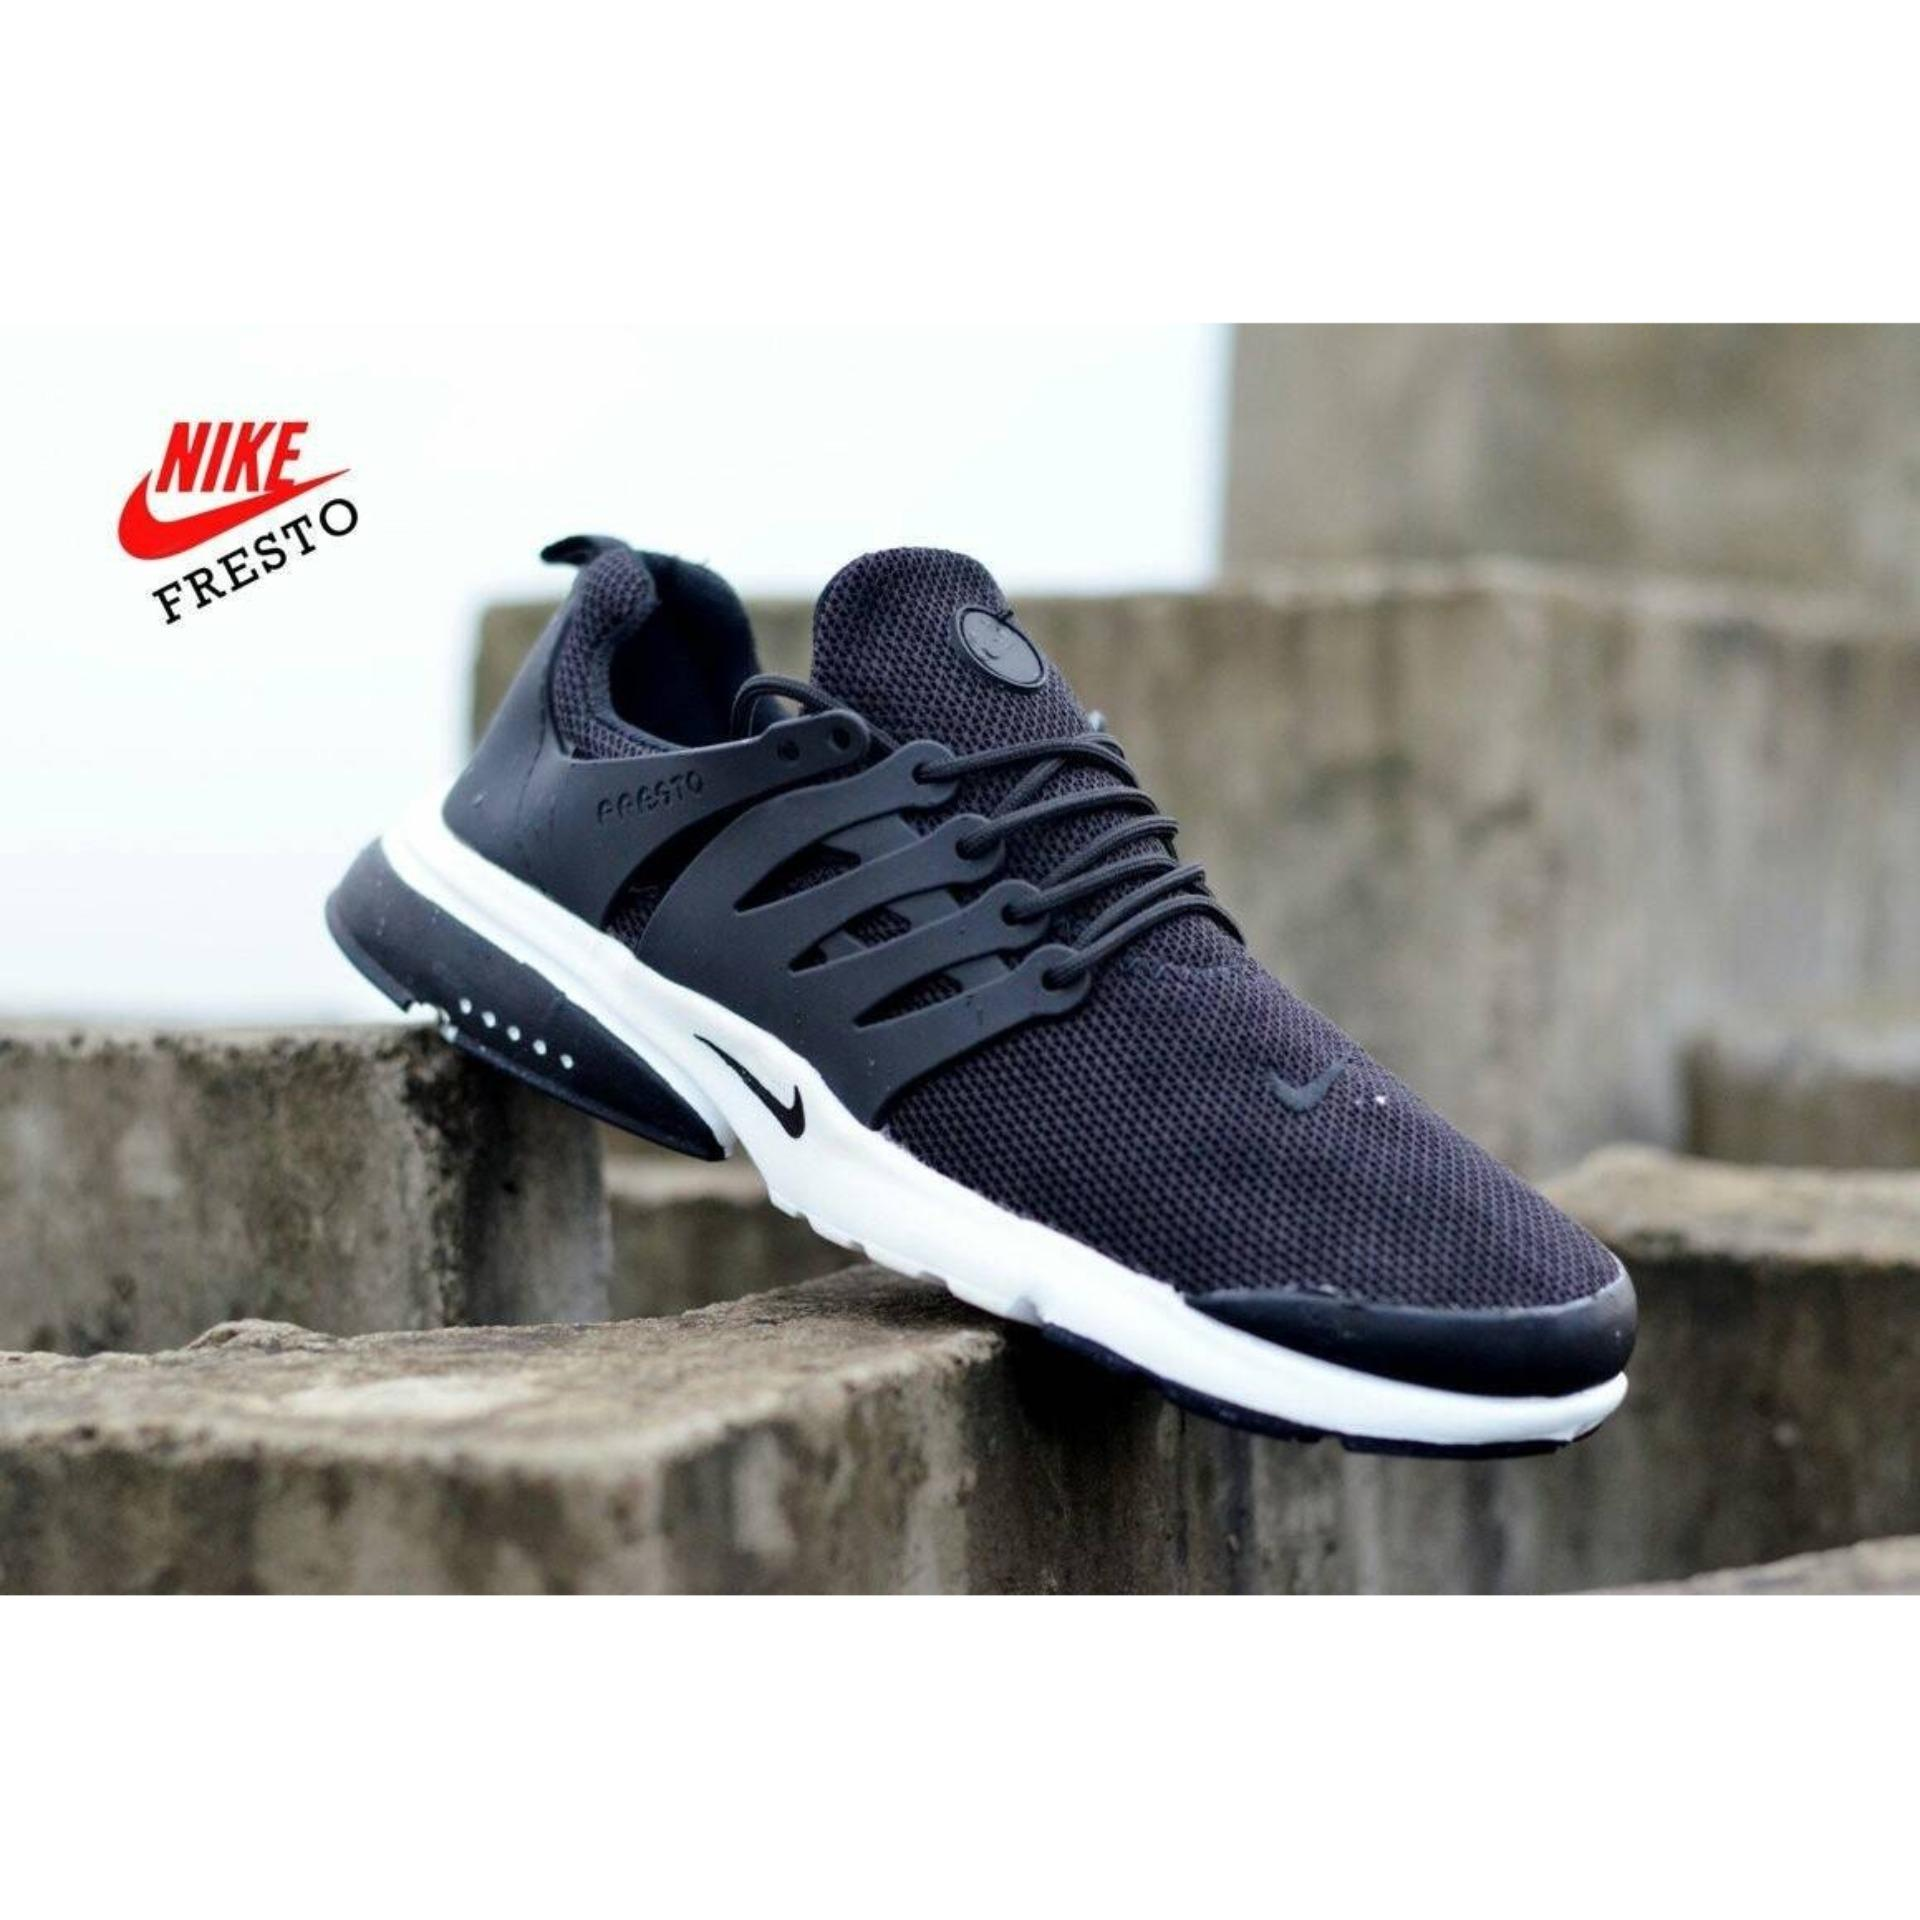 Nike Air Relentless 6 Msl 843881401 Sepatu Larirunning Pria Basket Mamba Instinct Blue Original 852473 400 Lari Running 843881 010 100 Source